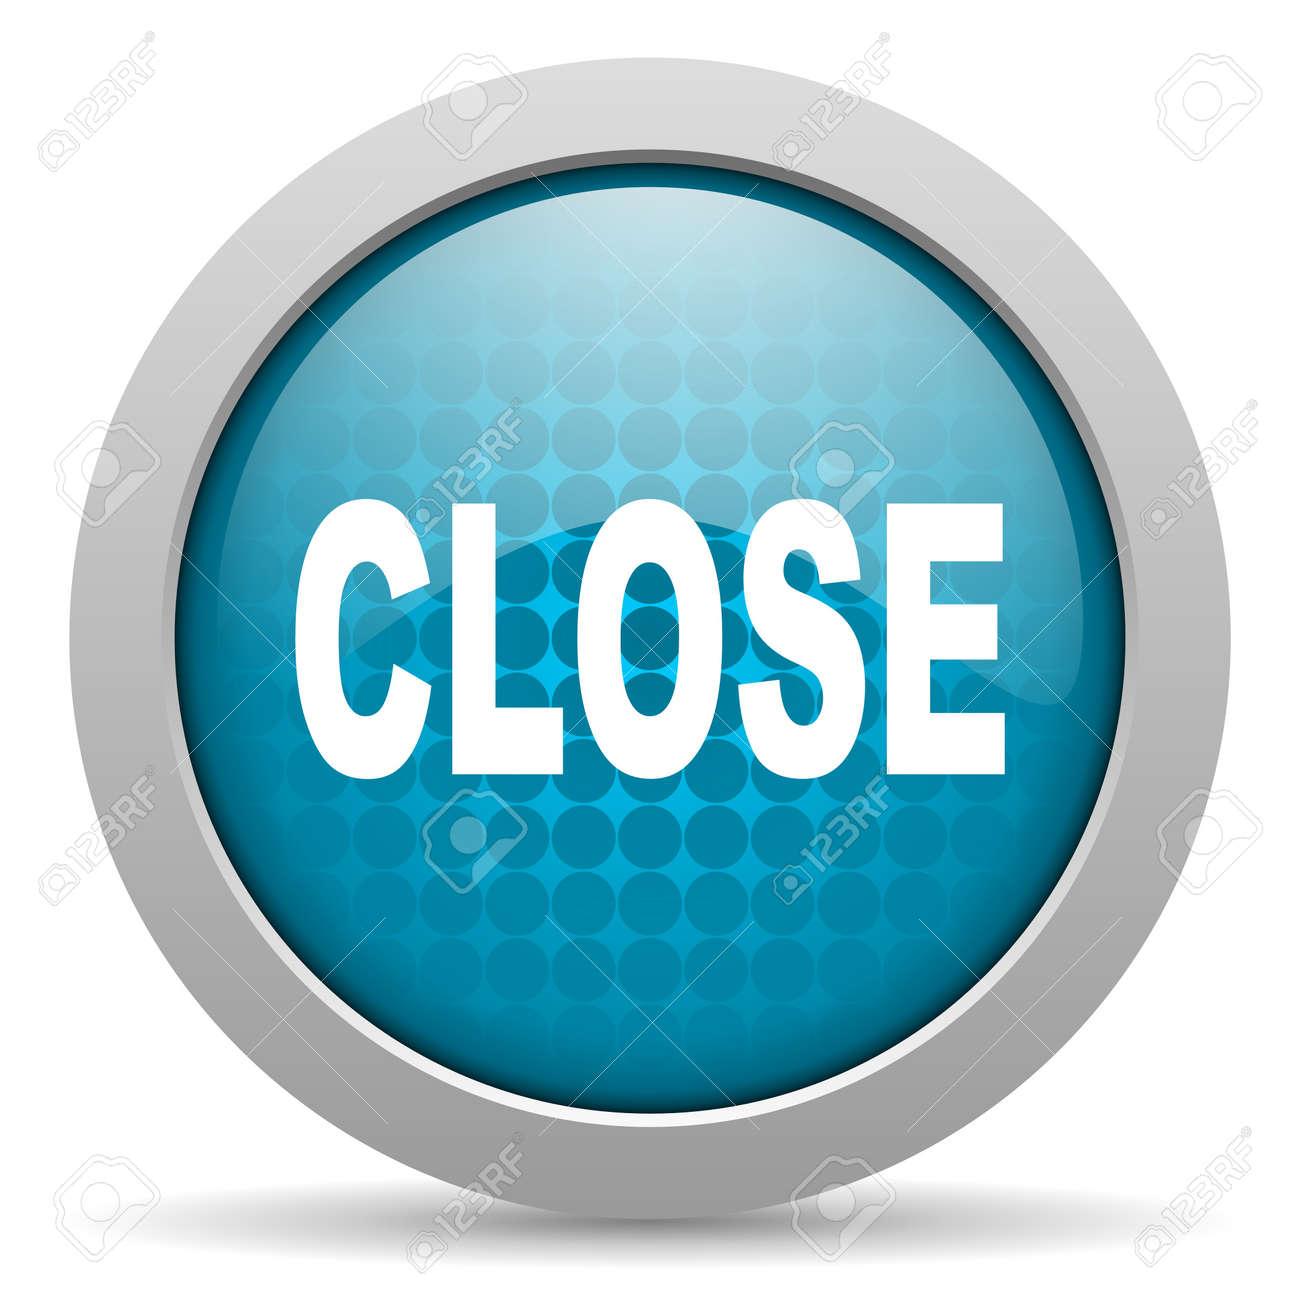 close blue circle web glossy icon Stock Photo - 19348192